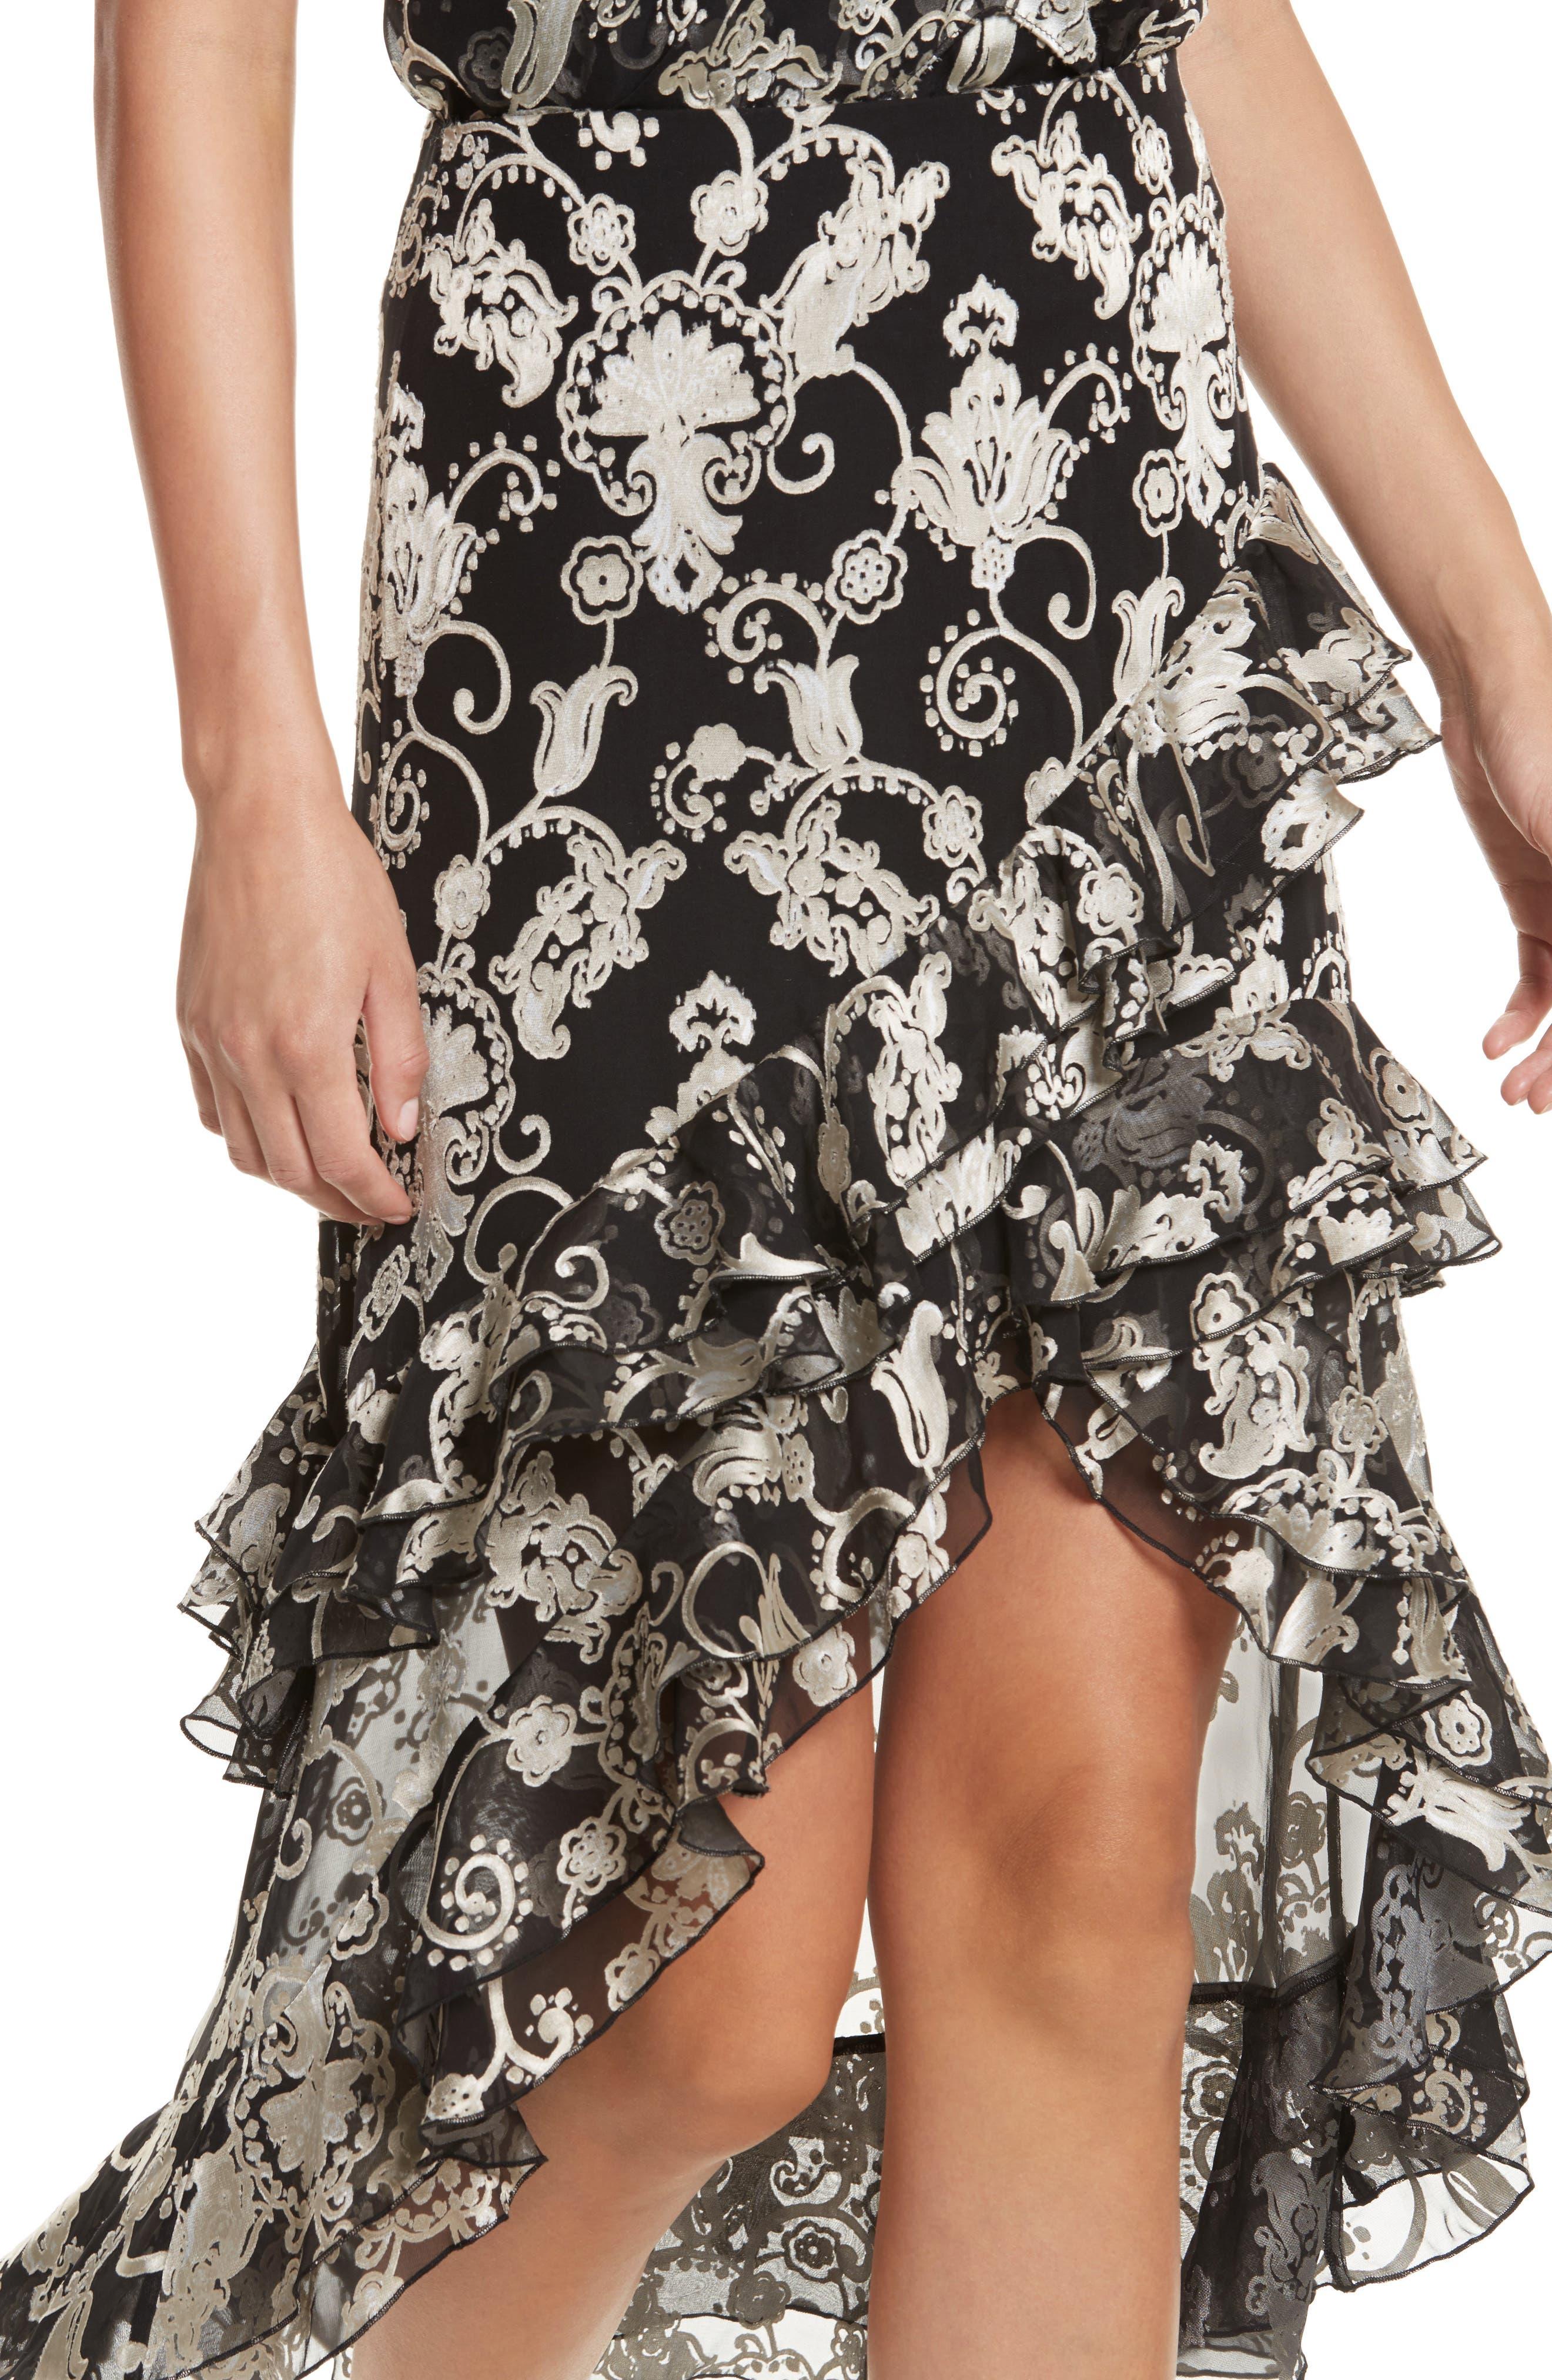 Sasha Asymmetrical Tiered Ruffle Skirt,                             Alternate thumbnail 4, color,                             009